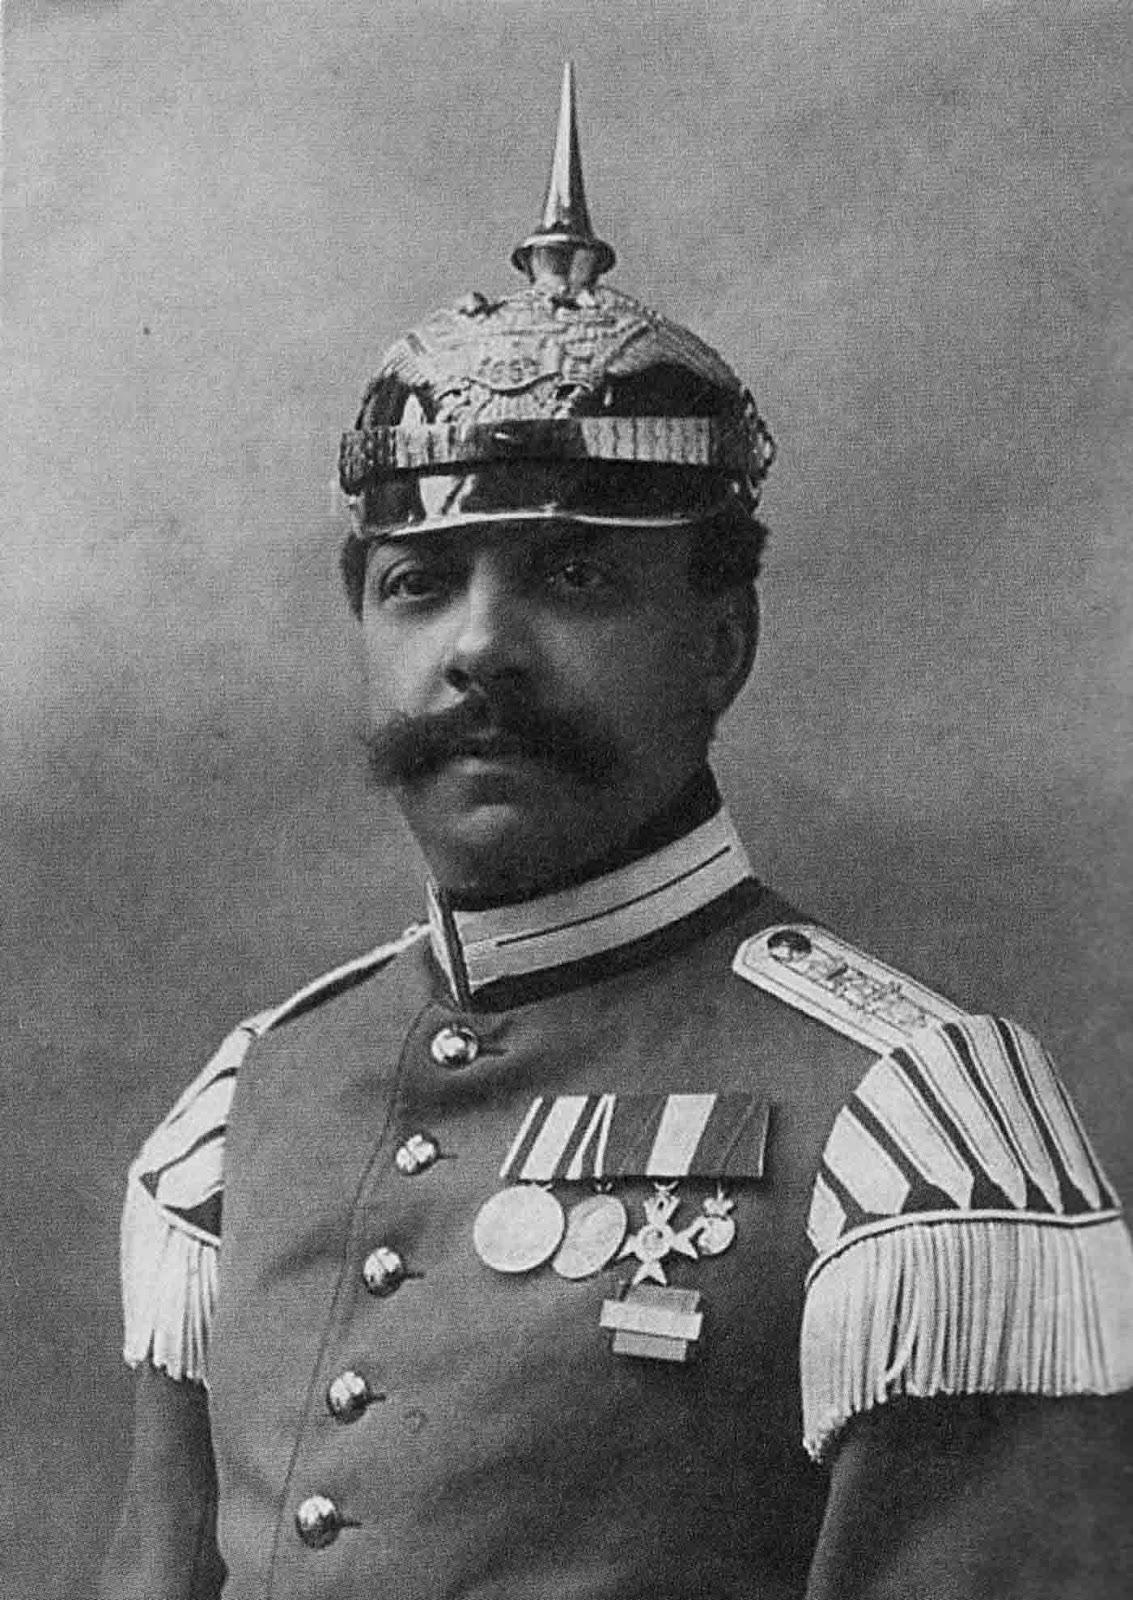 Music Master Gustav Sabac el Cher, 1st Prussian Grenadiers. 1908.